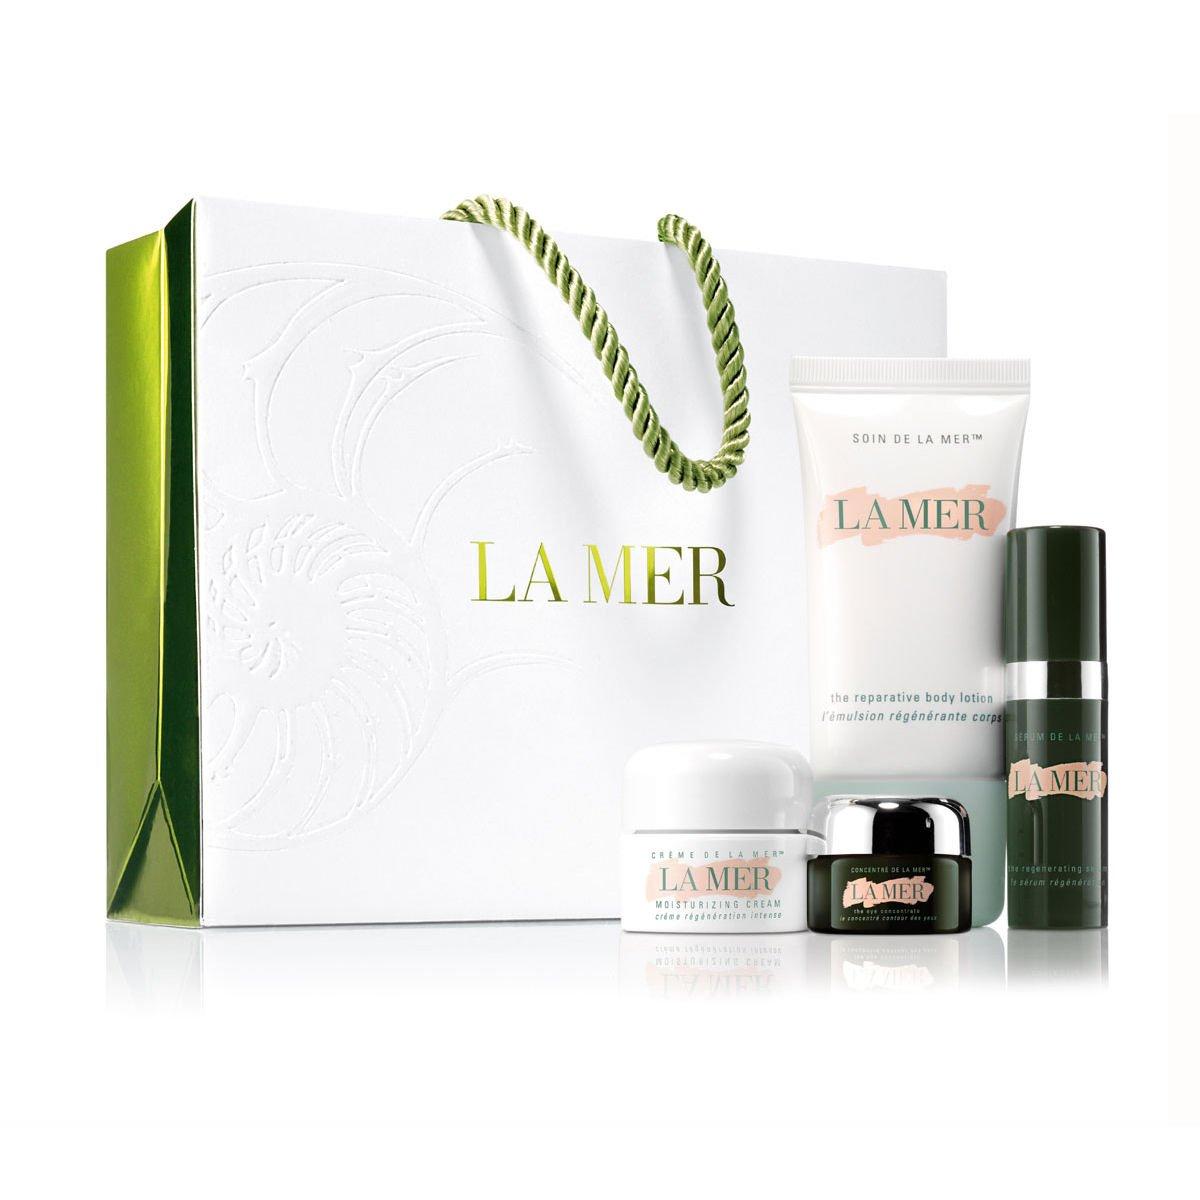 Amazon.com: La Mer Skincare Set: Beauty